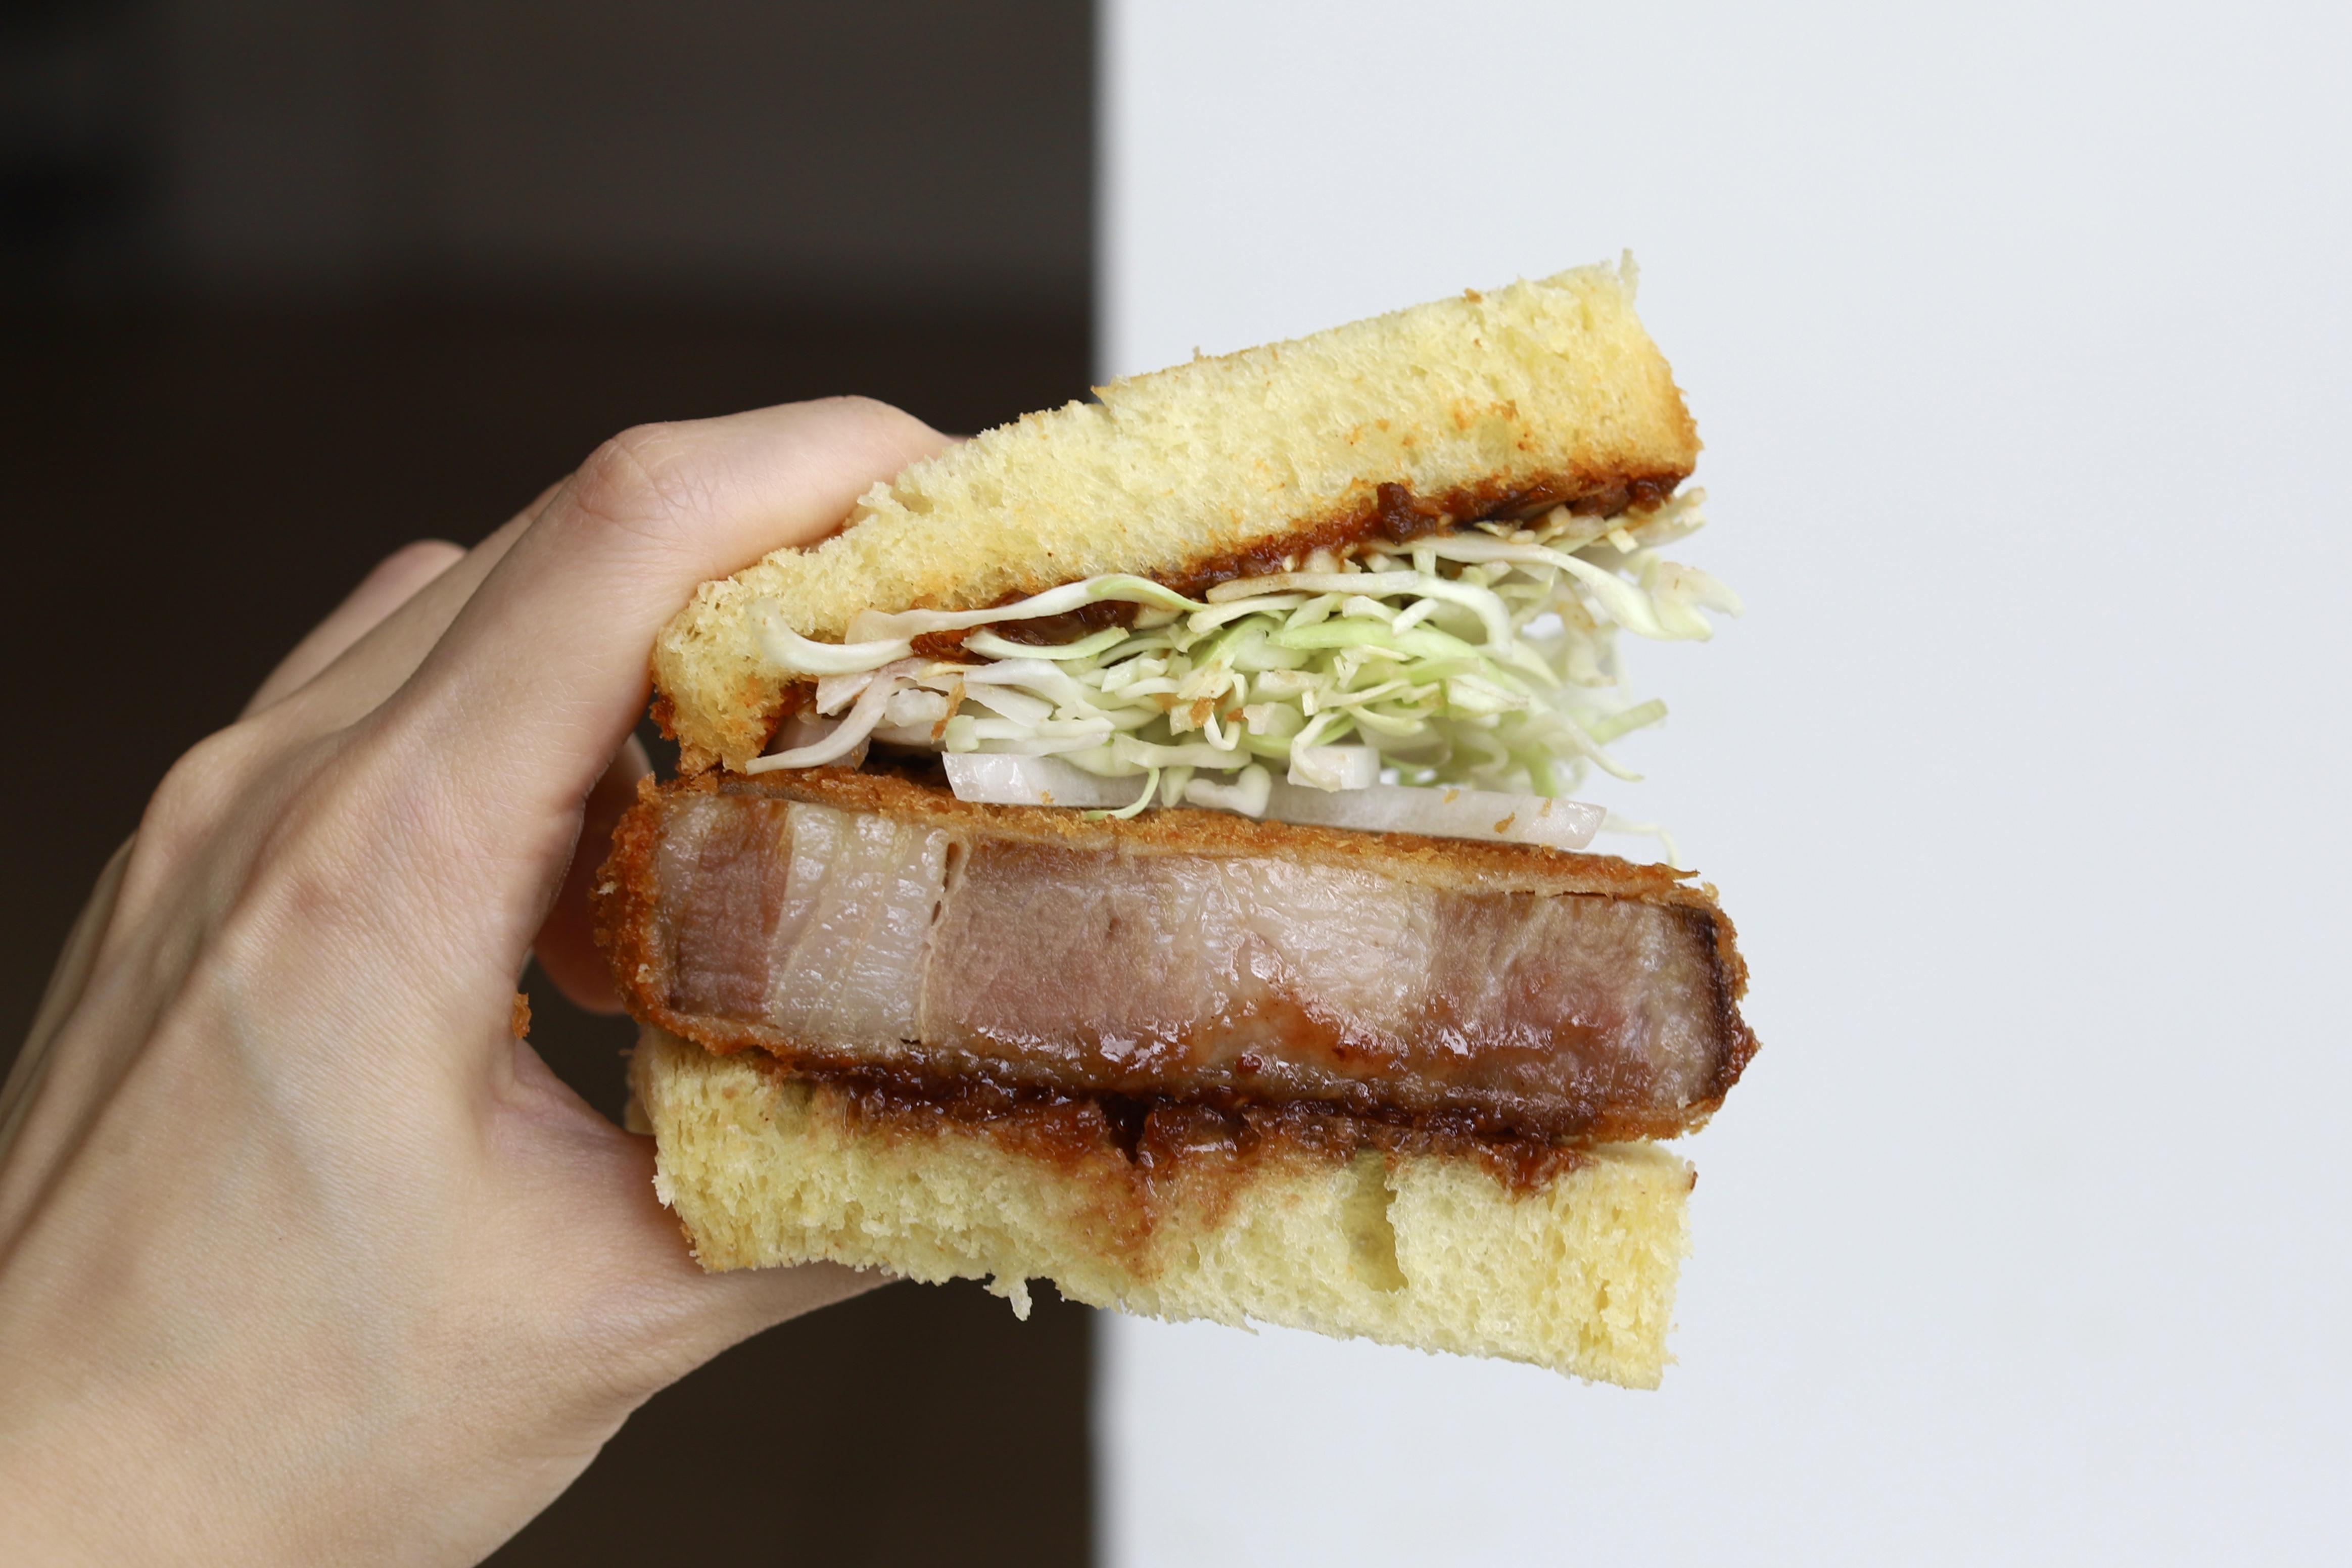 Tātā Eatery and Tōu's Iberican pork katsu sando, created at home